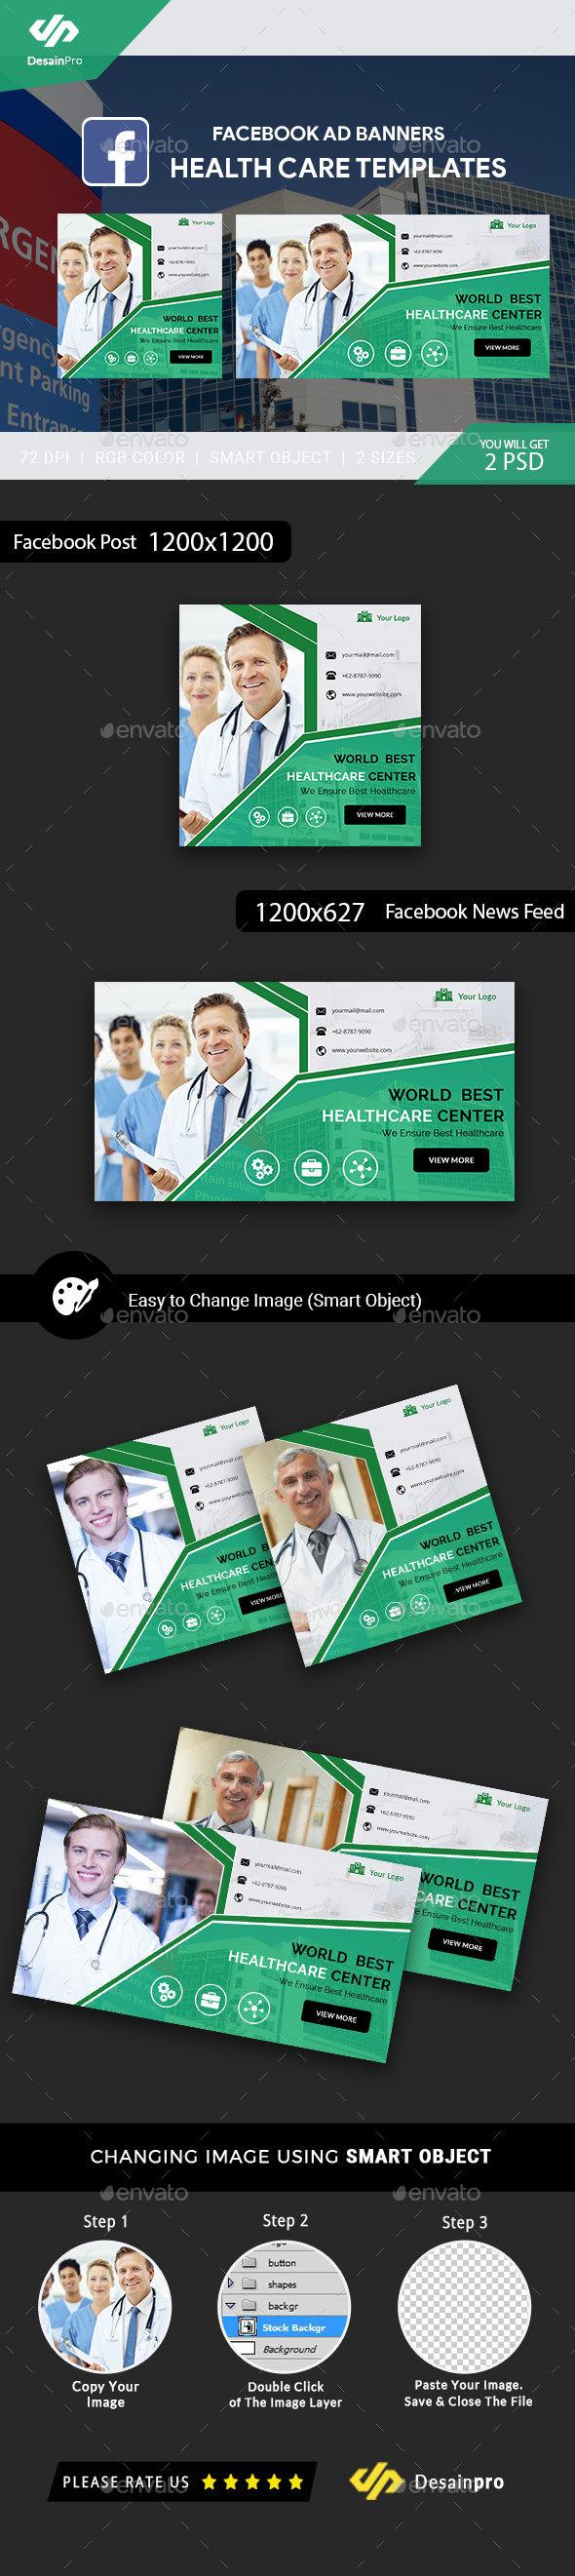 Health Care Facebook Ad Banners - AR - Social Media Web Elements